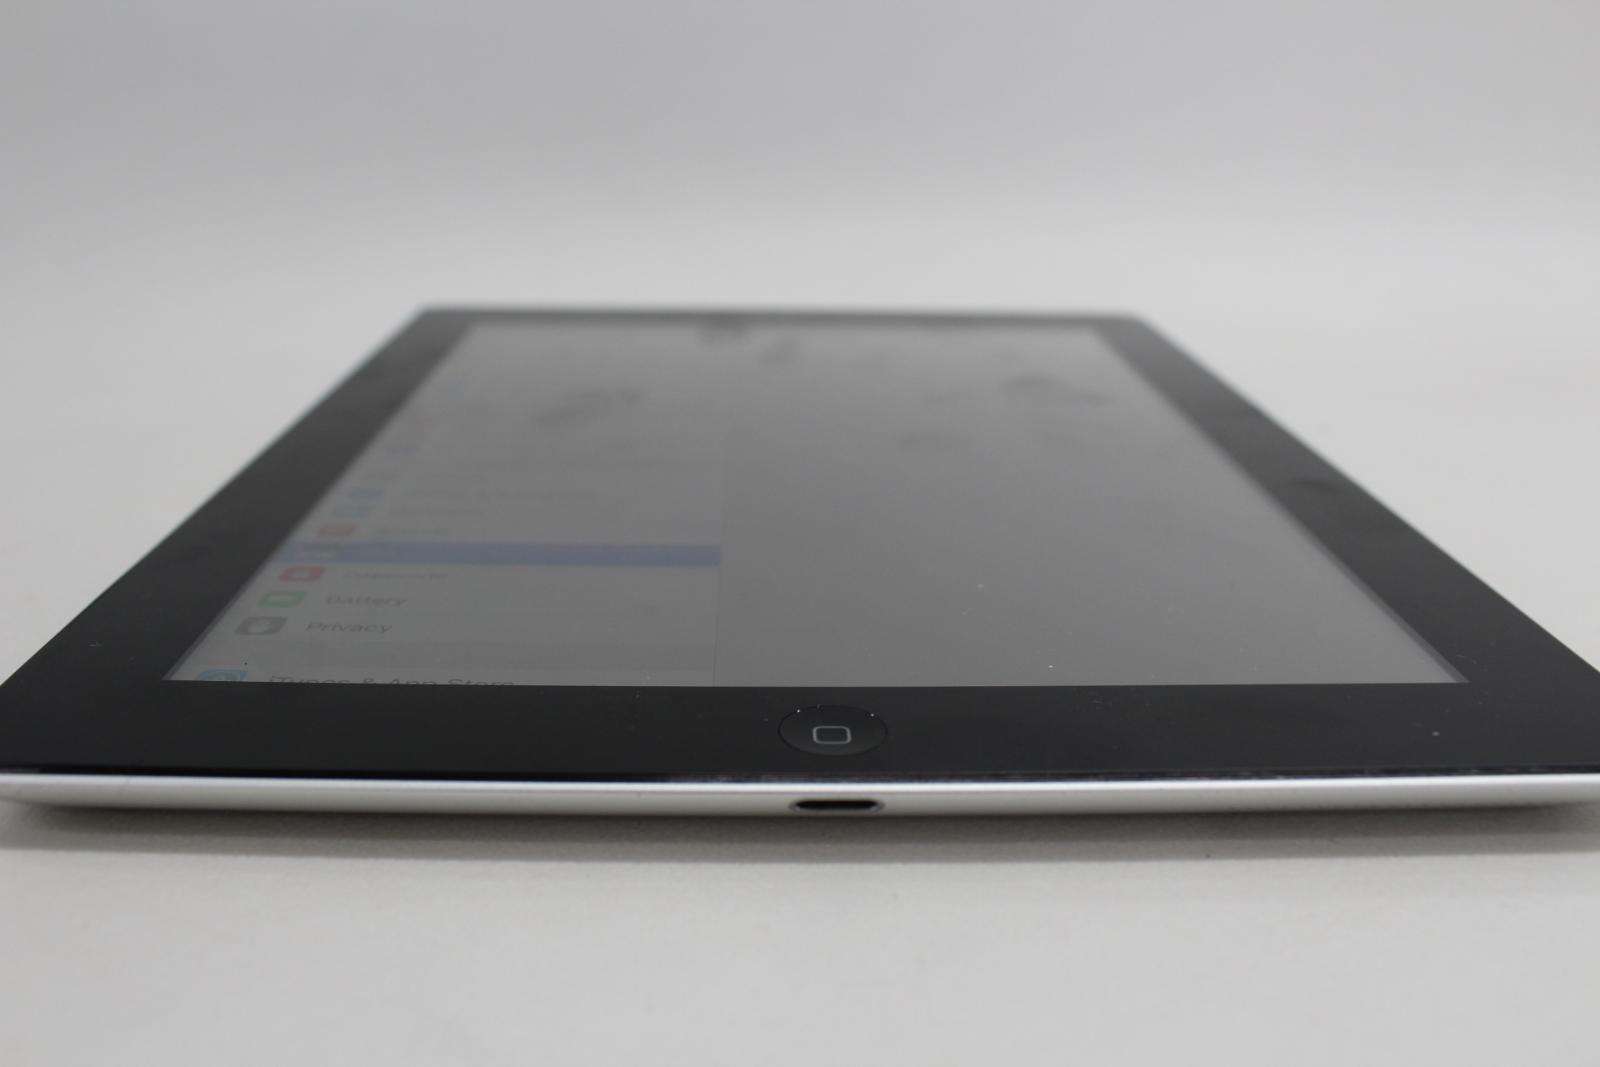 APPLE-iPad-4th-Gen-Tablet-9-7-inch-122-94GB-Black-Bezel-Wi-Fi-Model-A1460 thumbnail 4